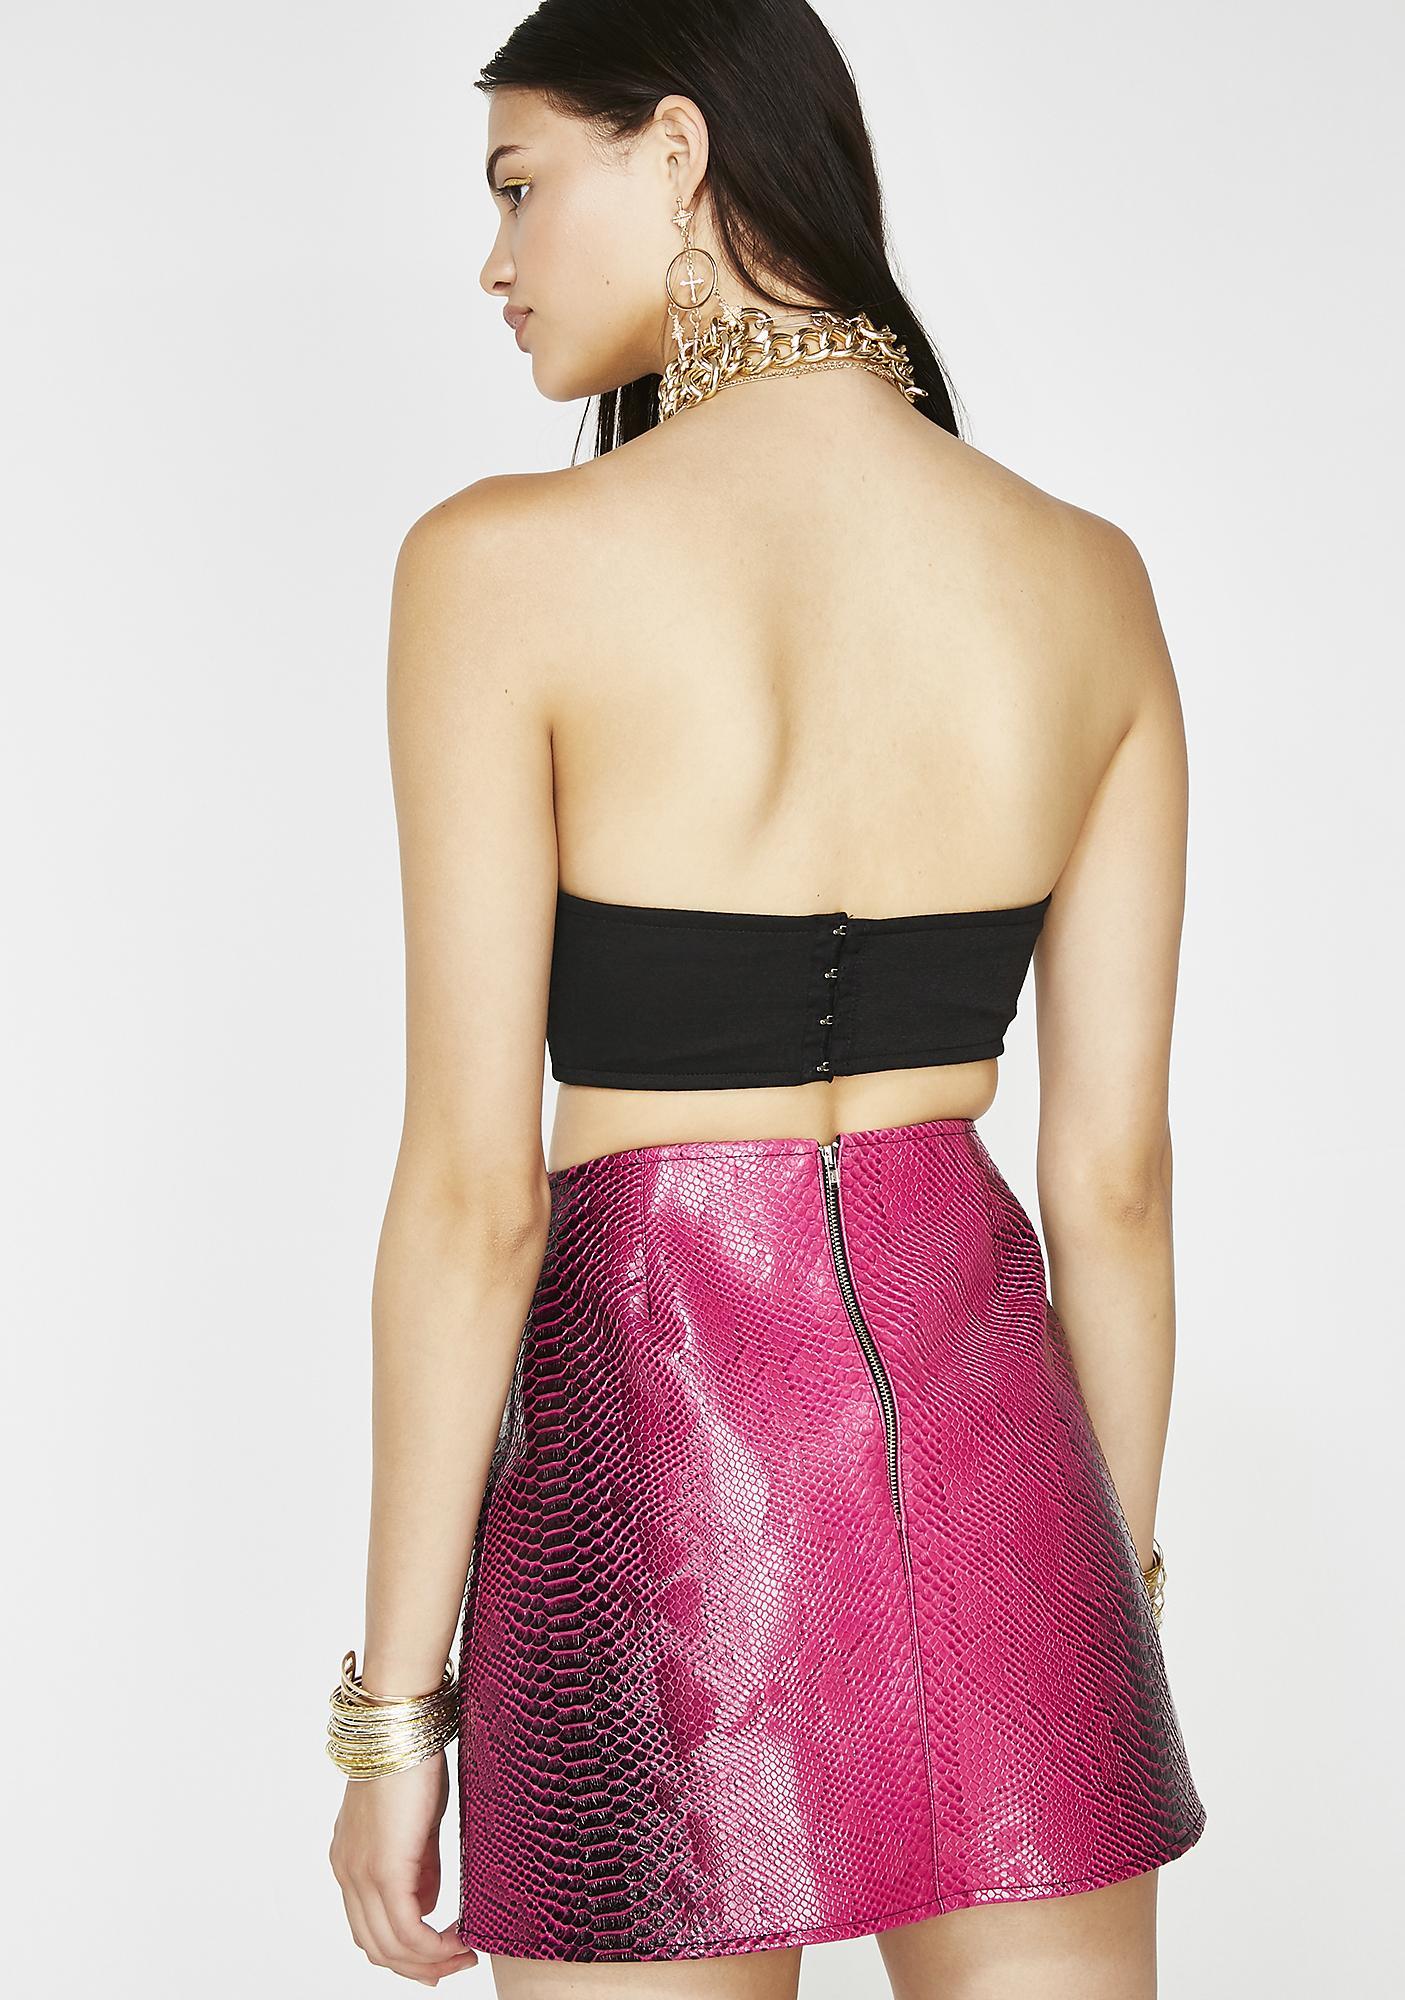 Sinful Seductress Vinyl Skirt